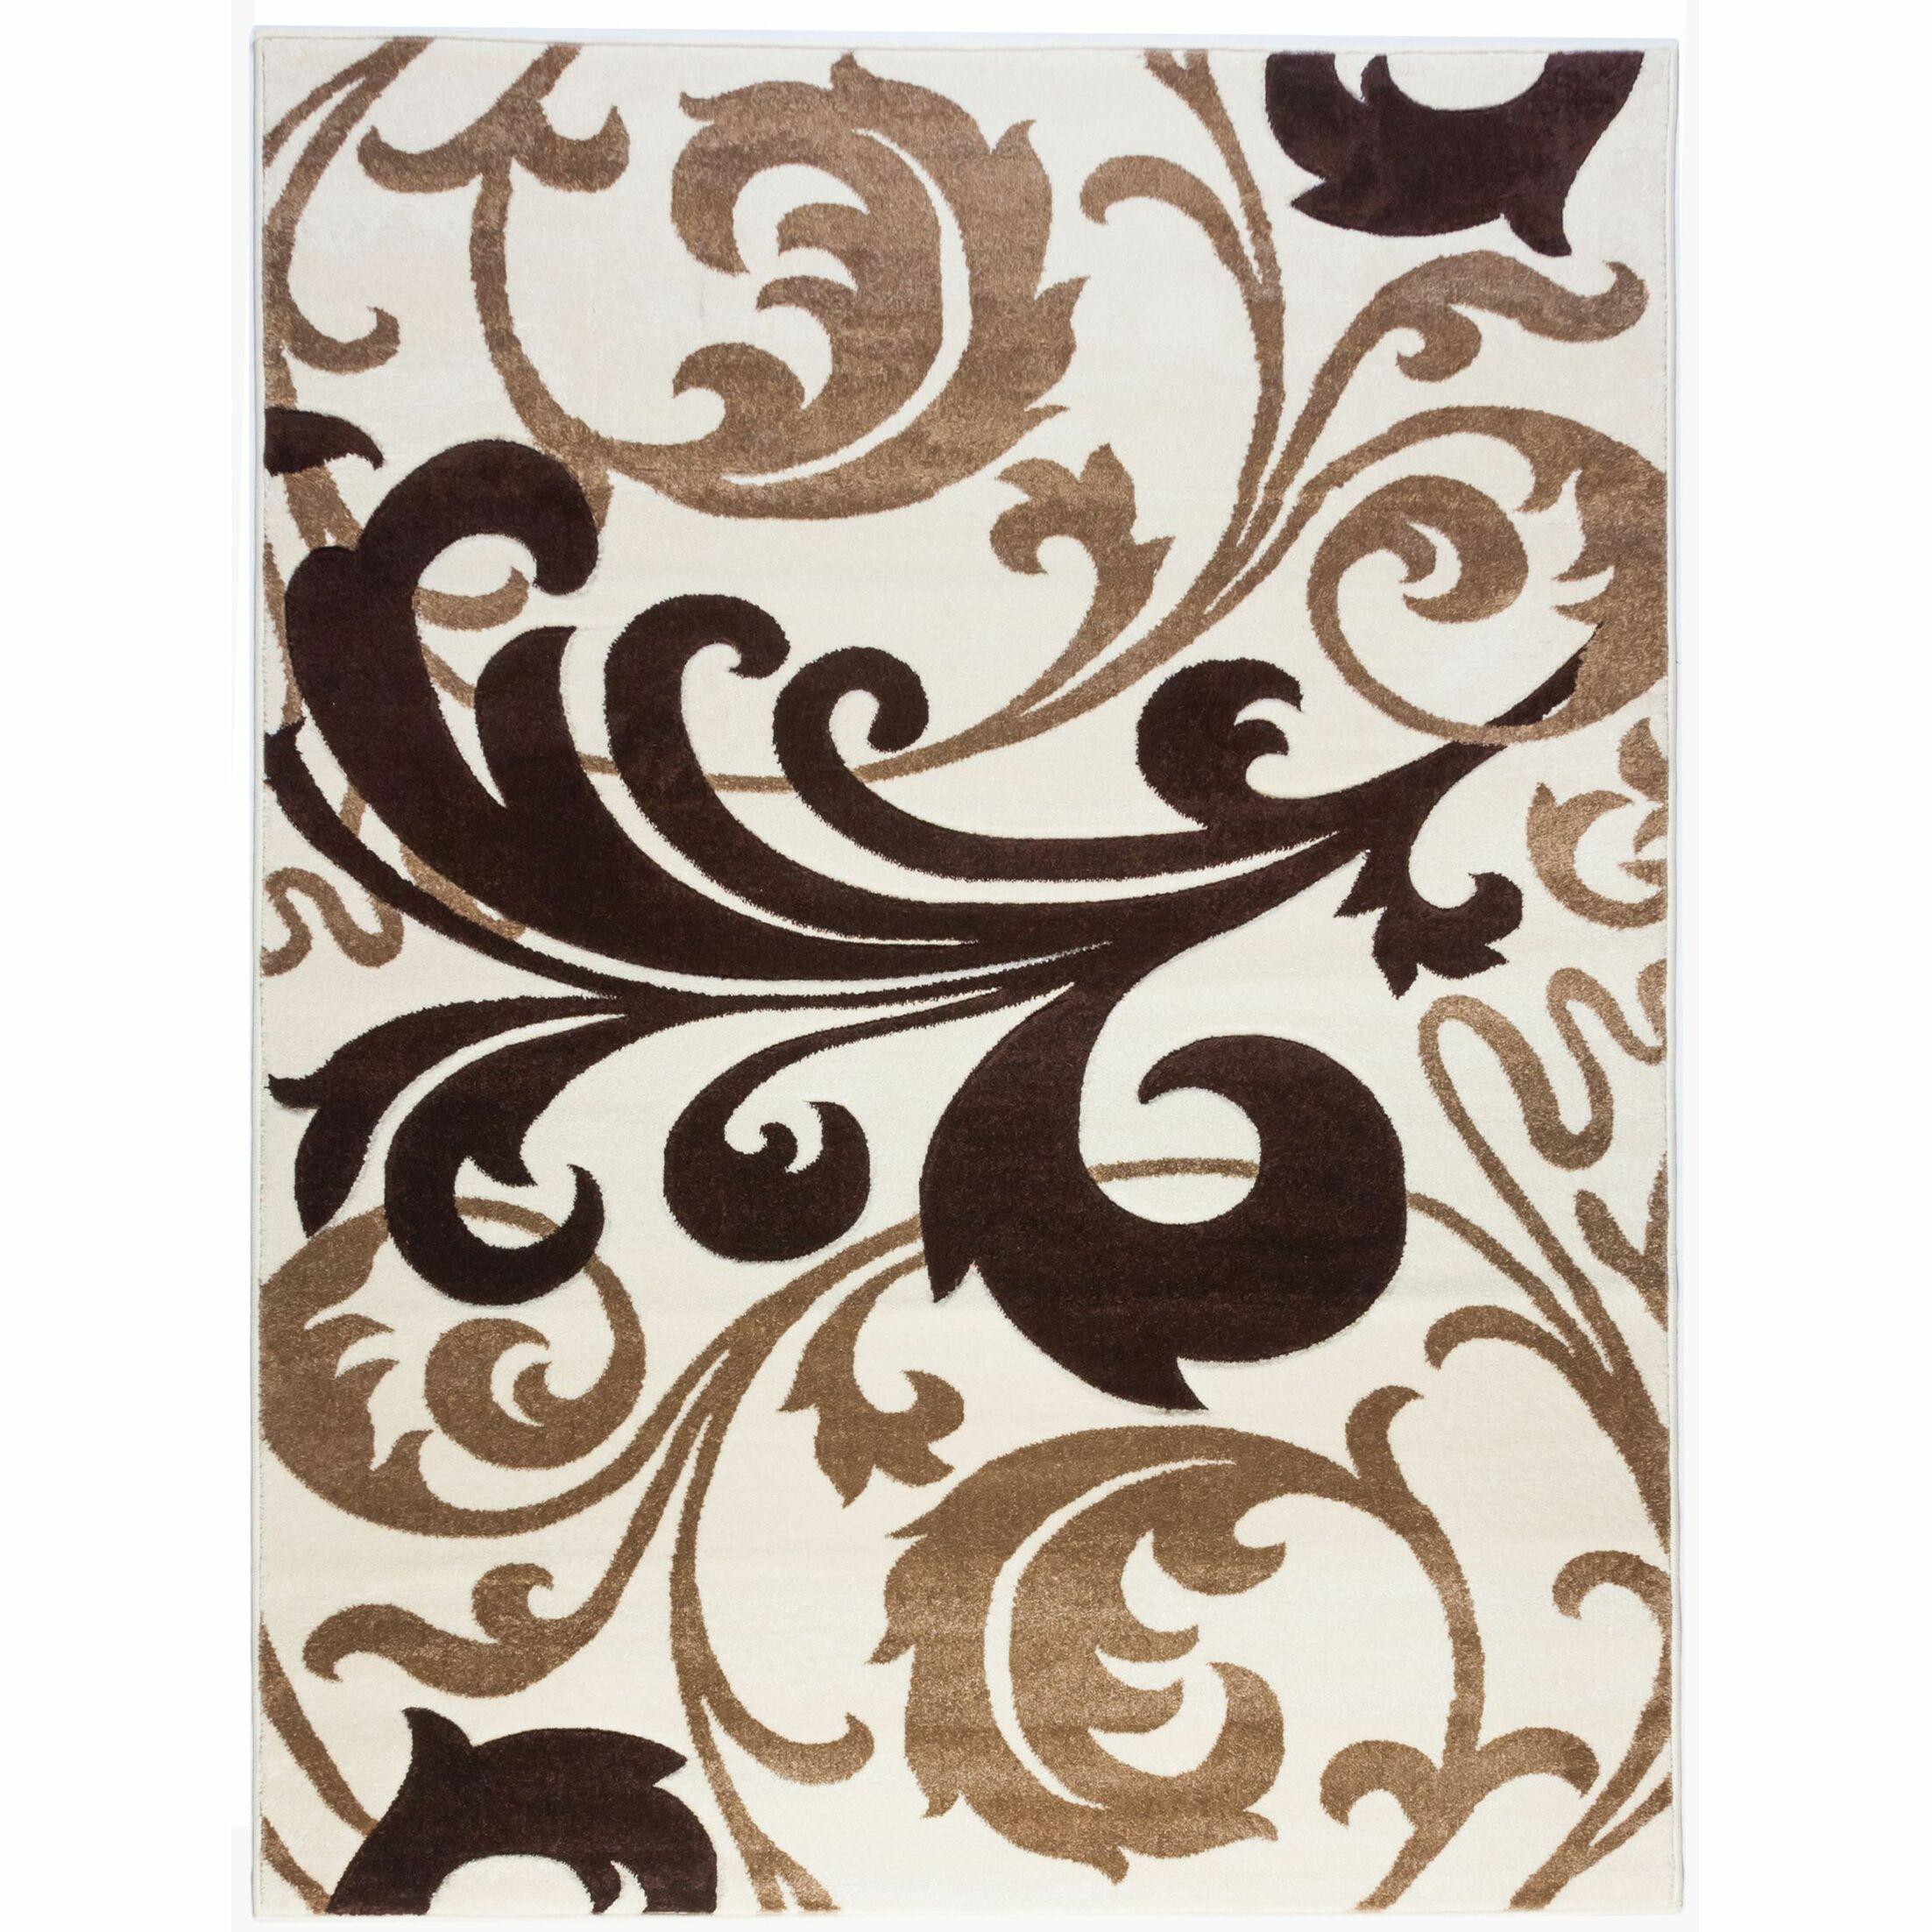 Everson Fleur De Lis Ivory Area Rug Rug Size: Rectangle 6'7